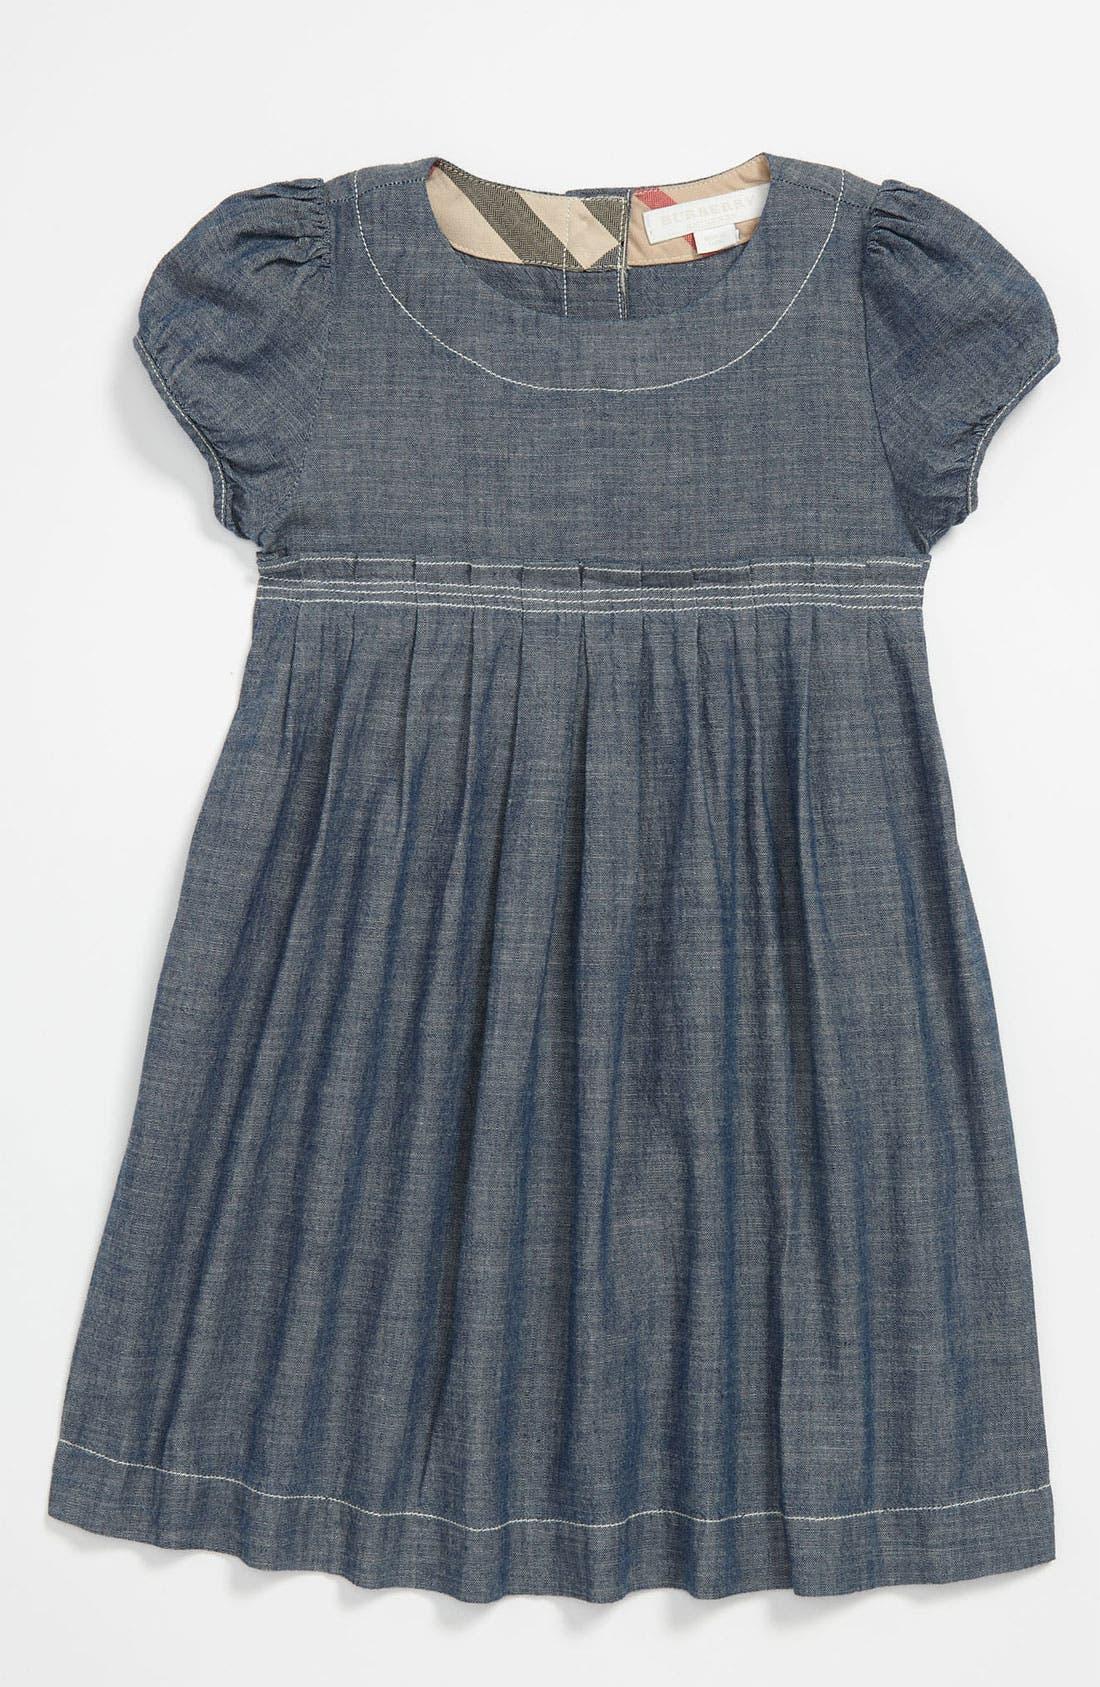 Main Image - Burberry 'Coralie' Dress (Toddler)